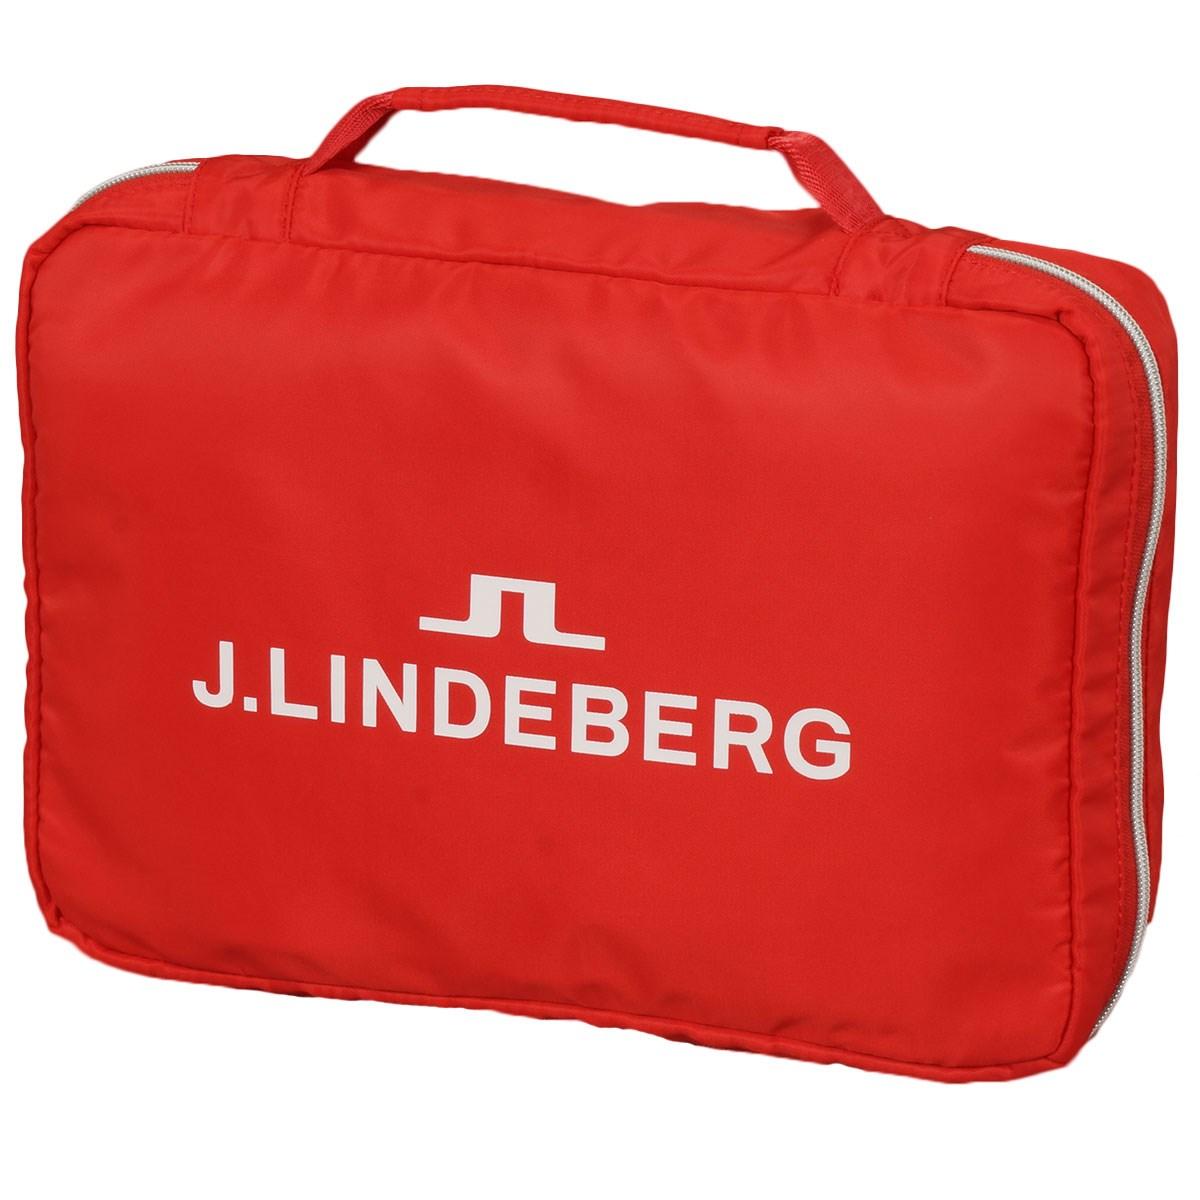 J.リンドバーグ トラベル バッグ イン バッグ